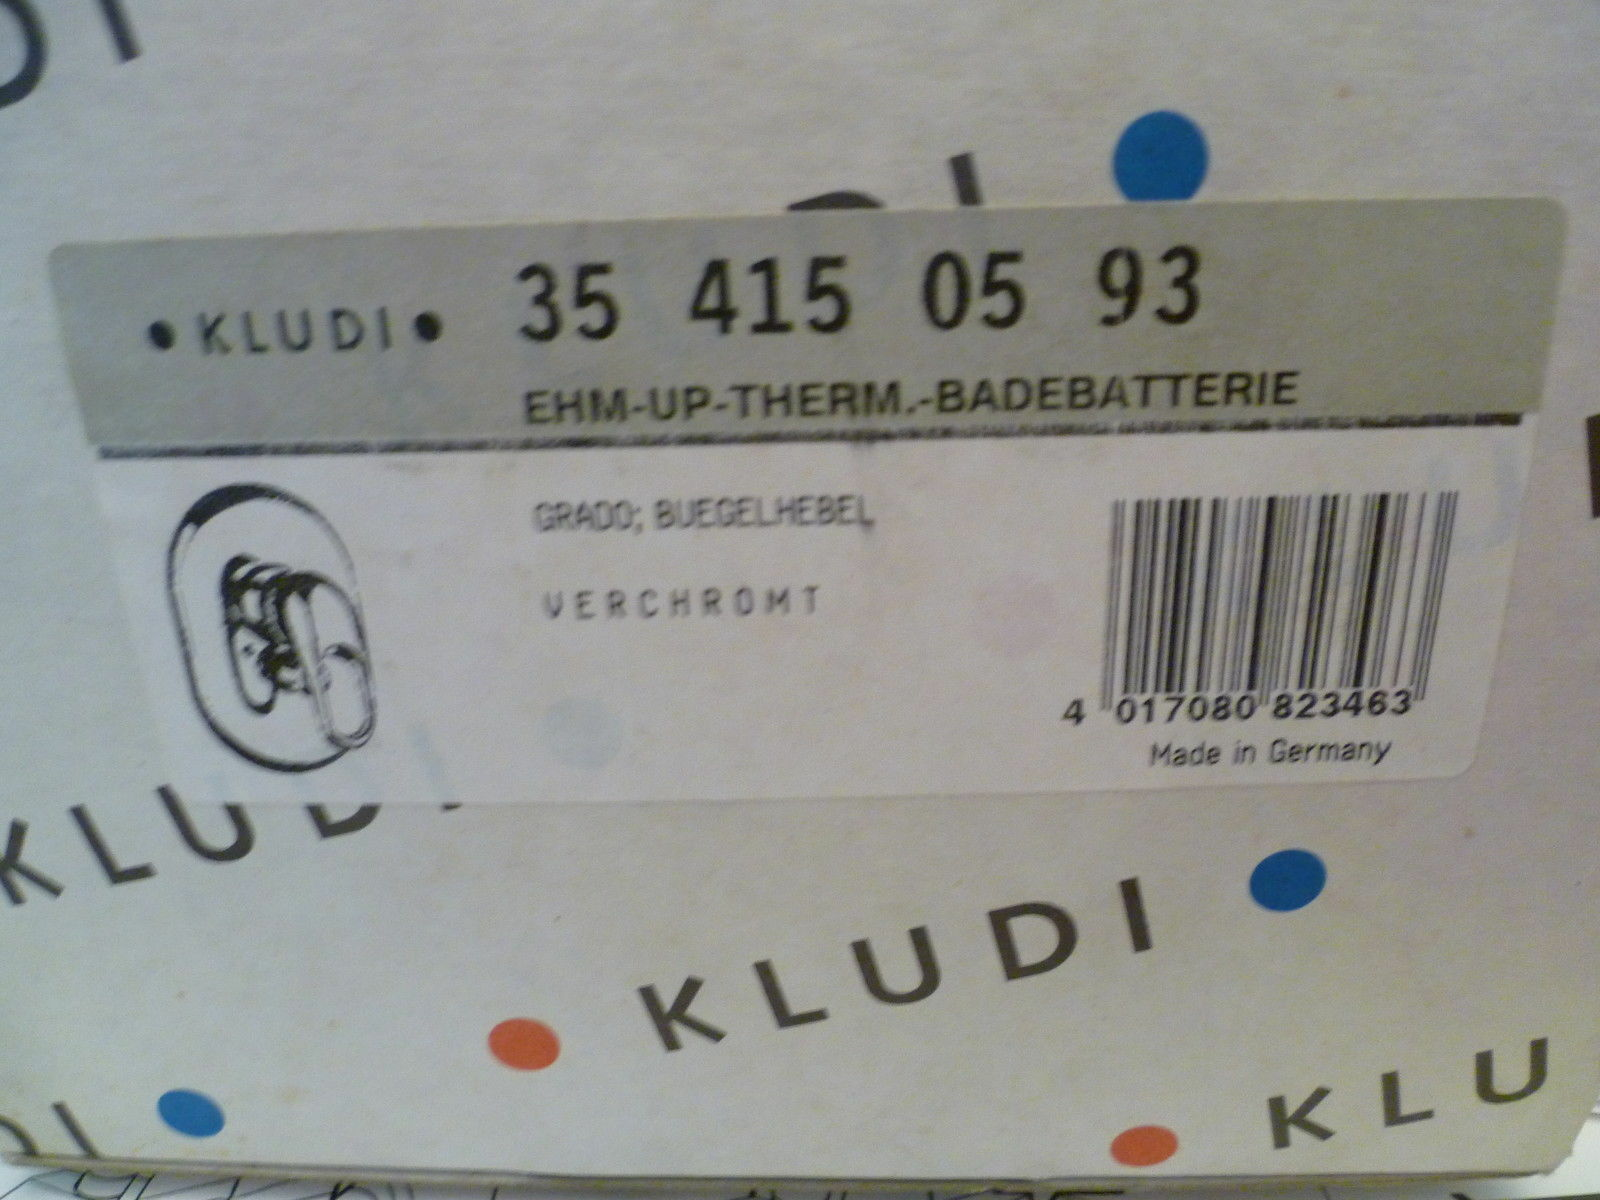 KLUDI GRADO THERMOSTAT UP-WANNENARMATUR BAUSATZ 2 Nr. 354150593 NEU